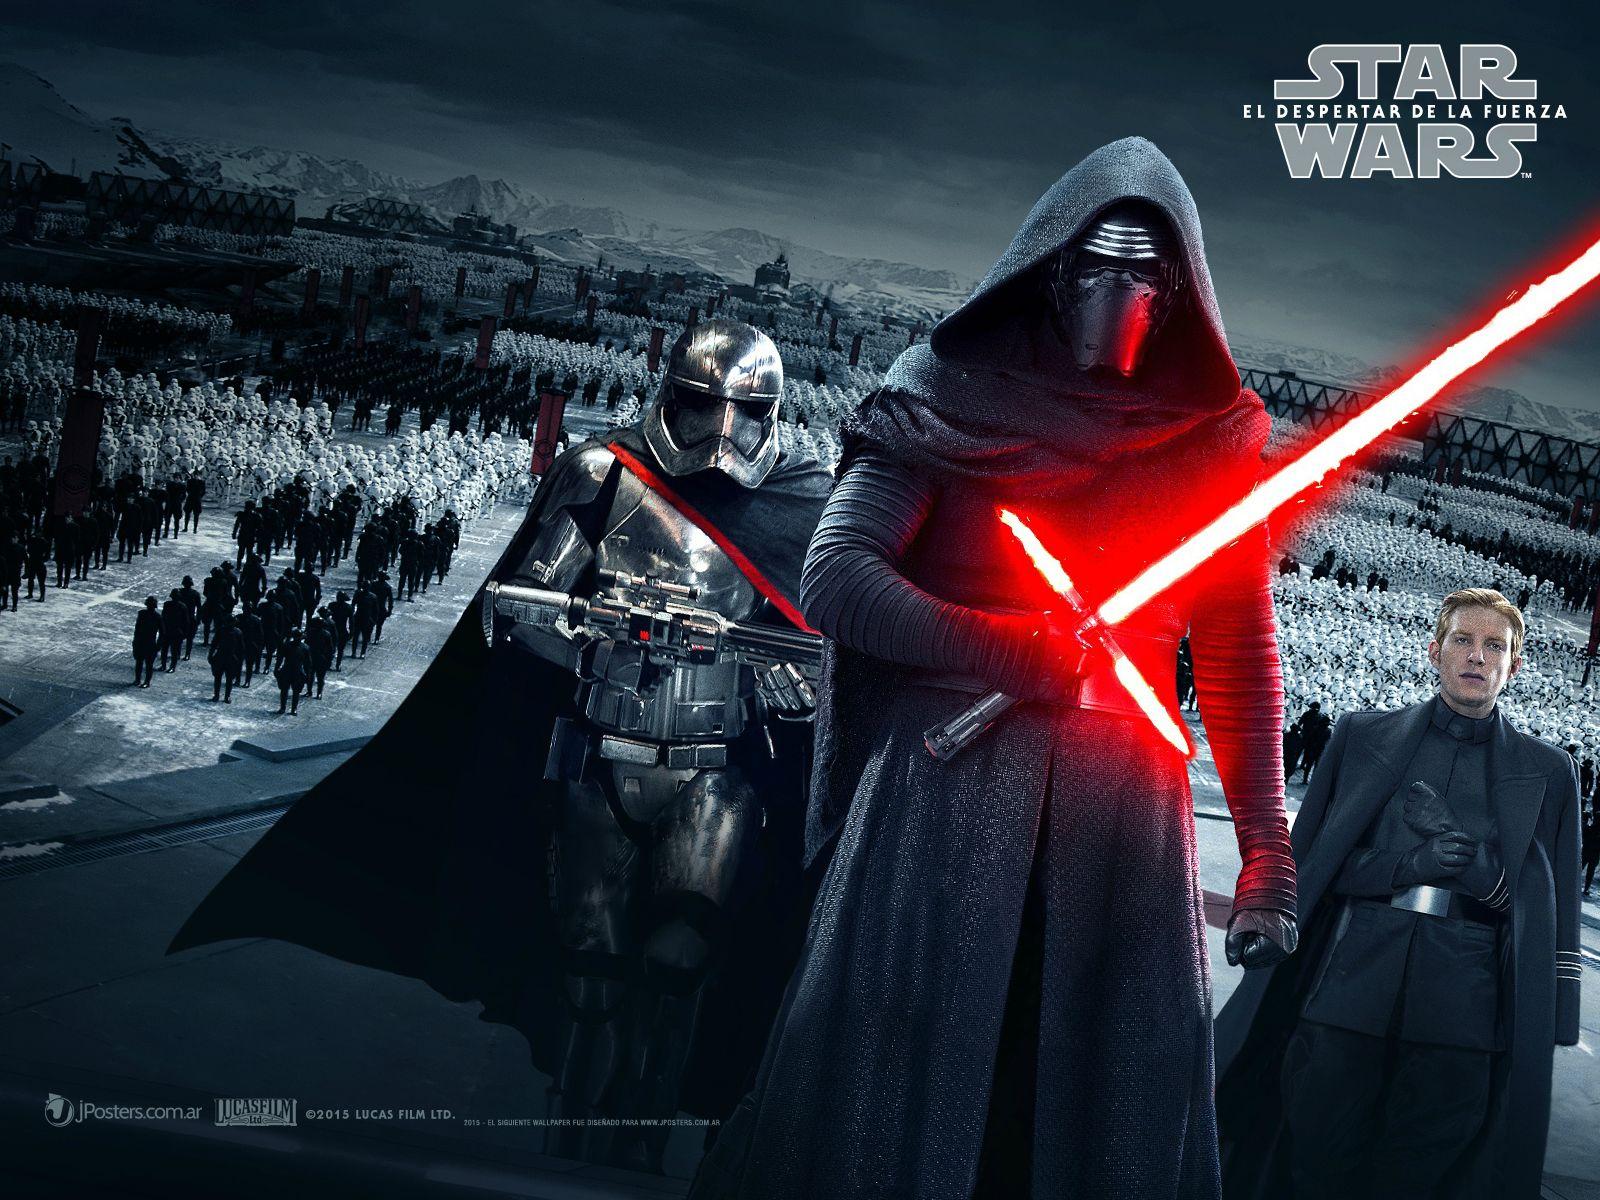 Star Wars The Force Awakens Star Wars Wallpaper 39209177 Fanpop